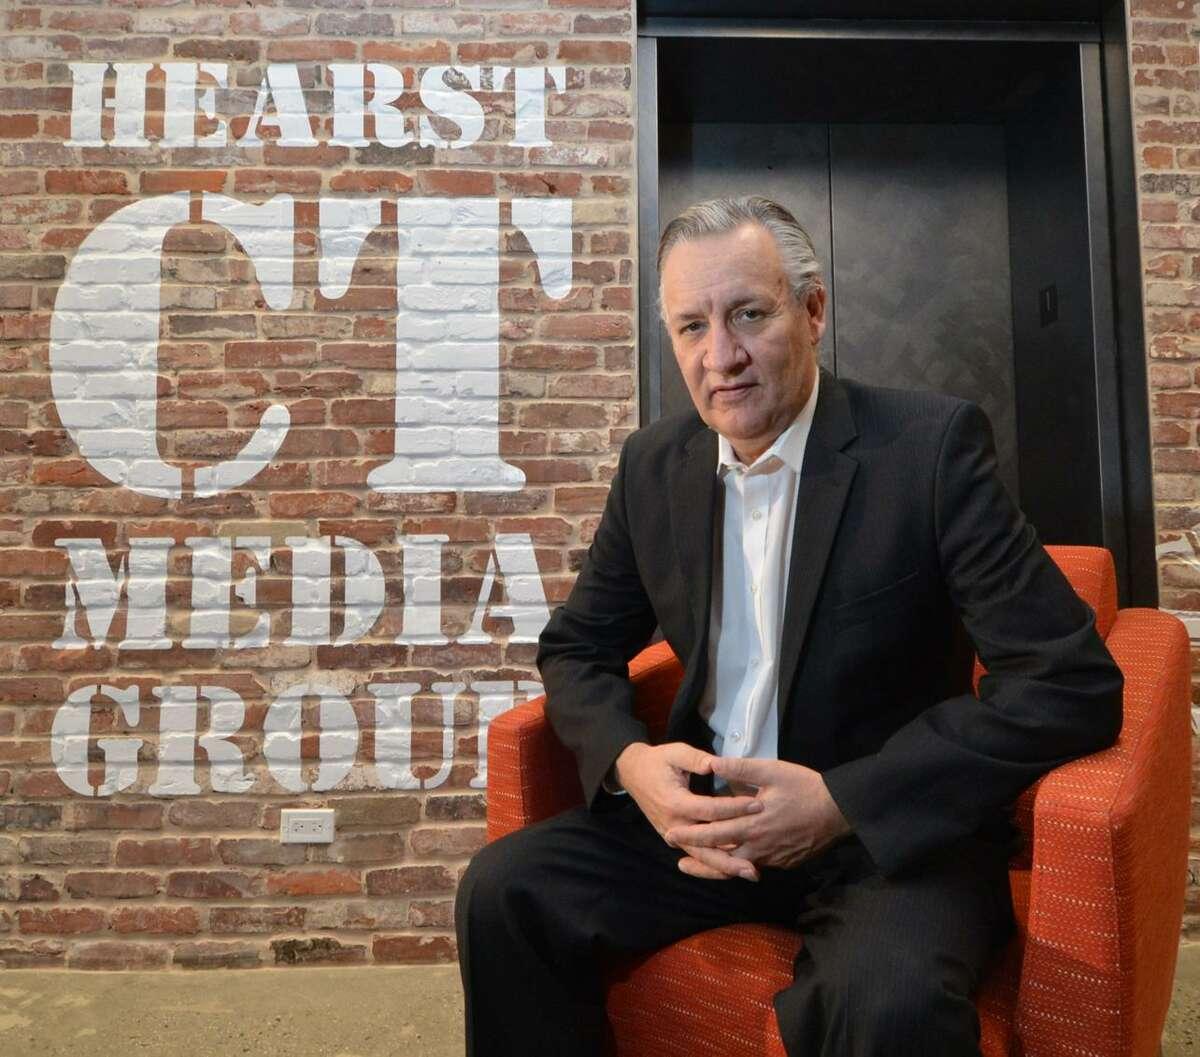 Sports columnist Jeff Jacobs